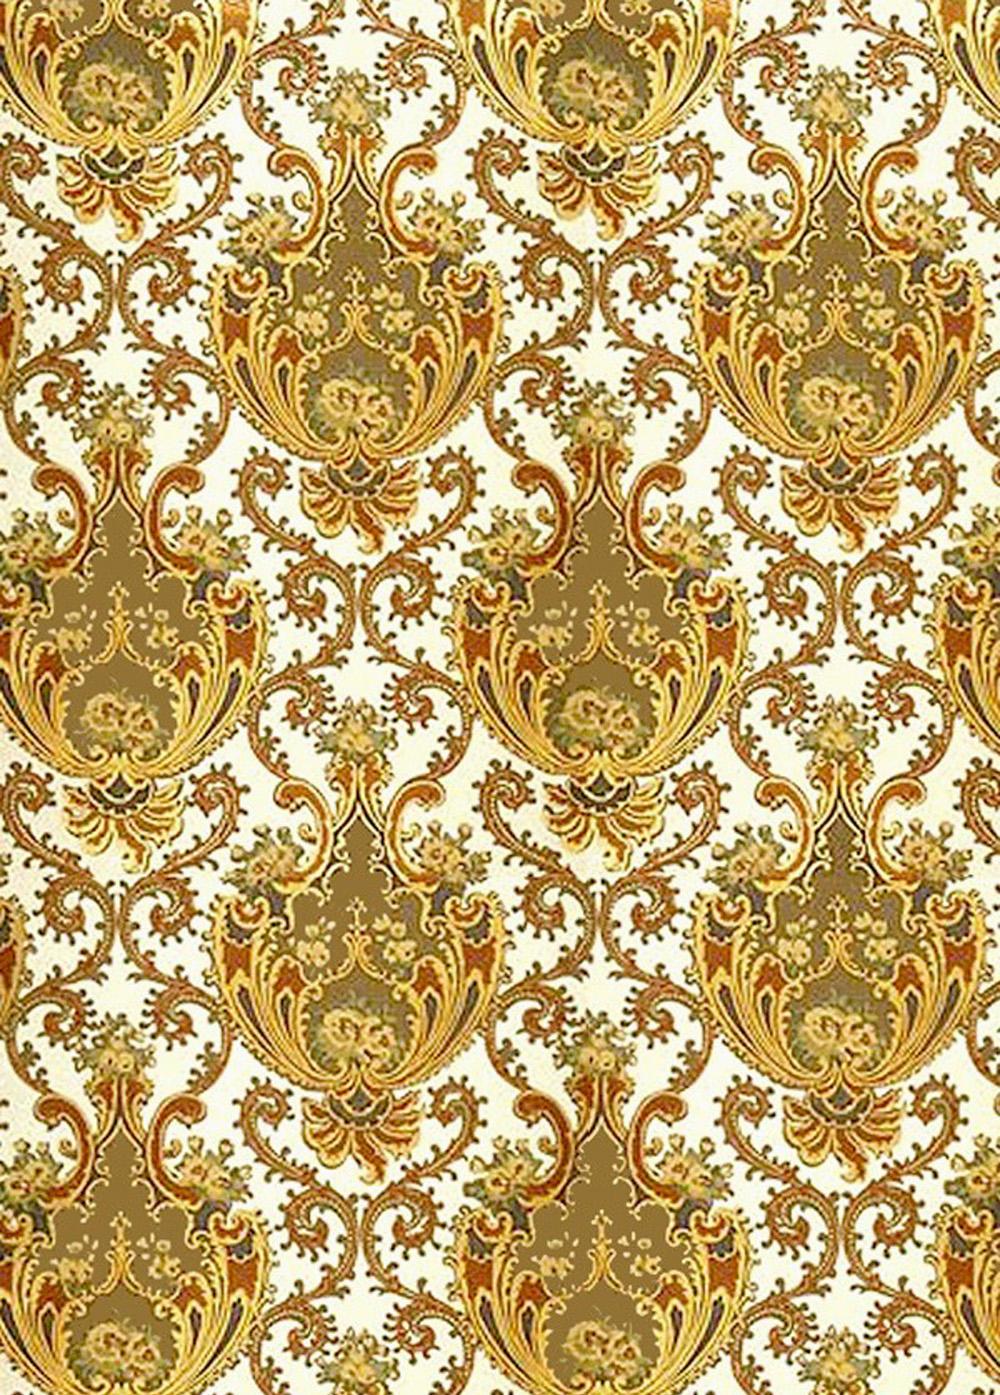 Victorian Wallpaper 1000x1395